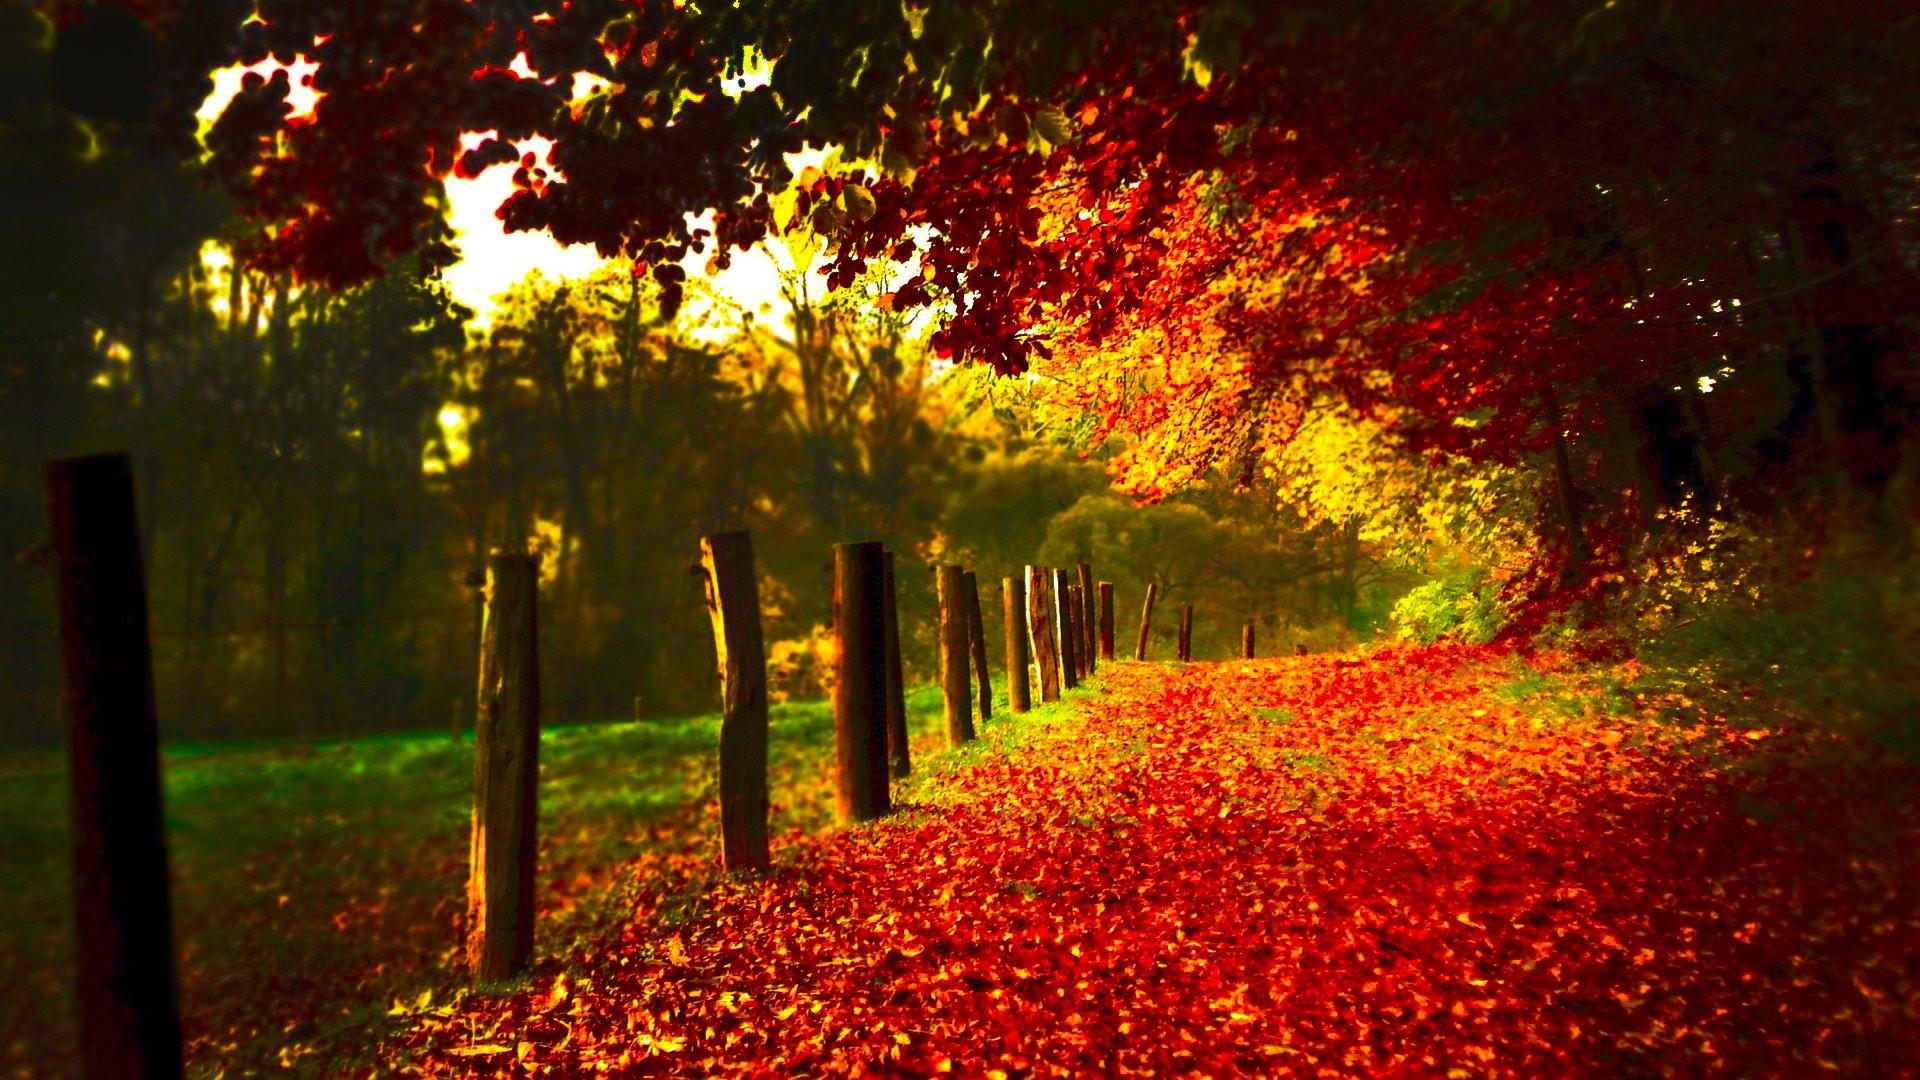 Autumn Scenery (id: 23662) – BUZZERG